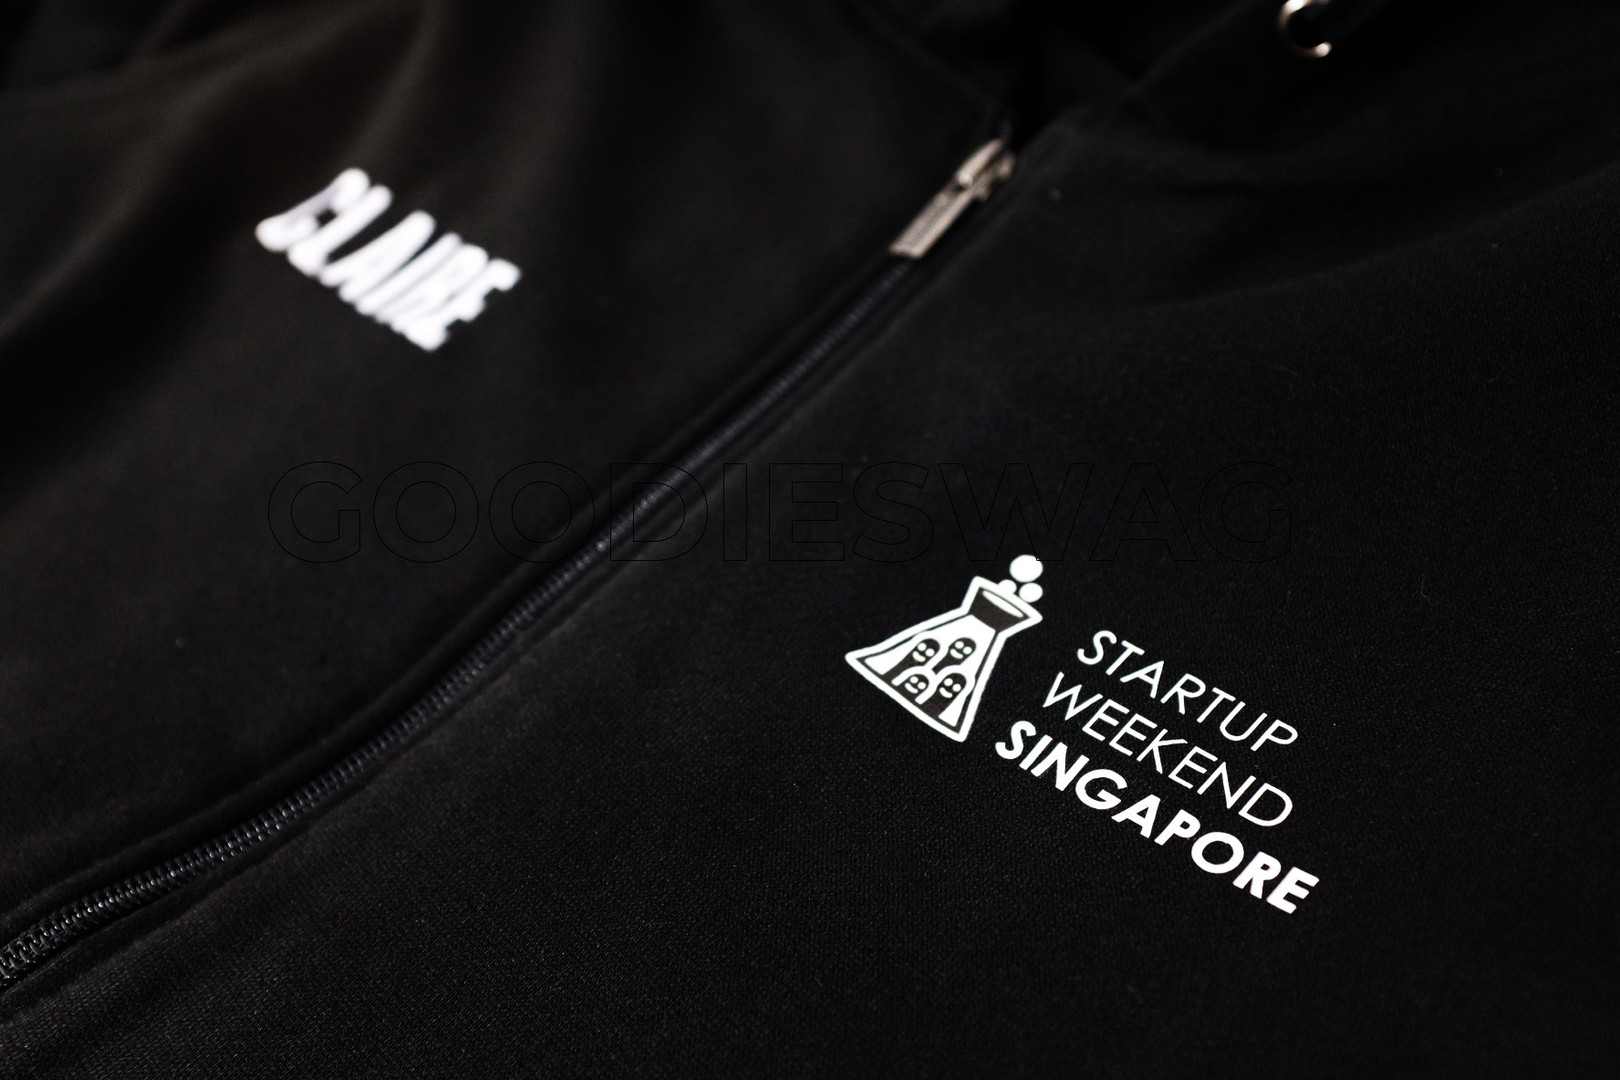 Startup Weekend Jacket Merchandise